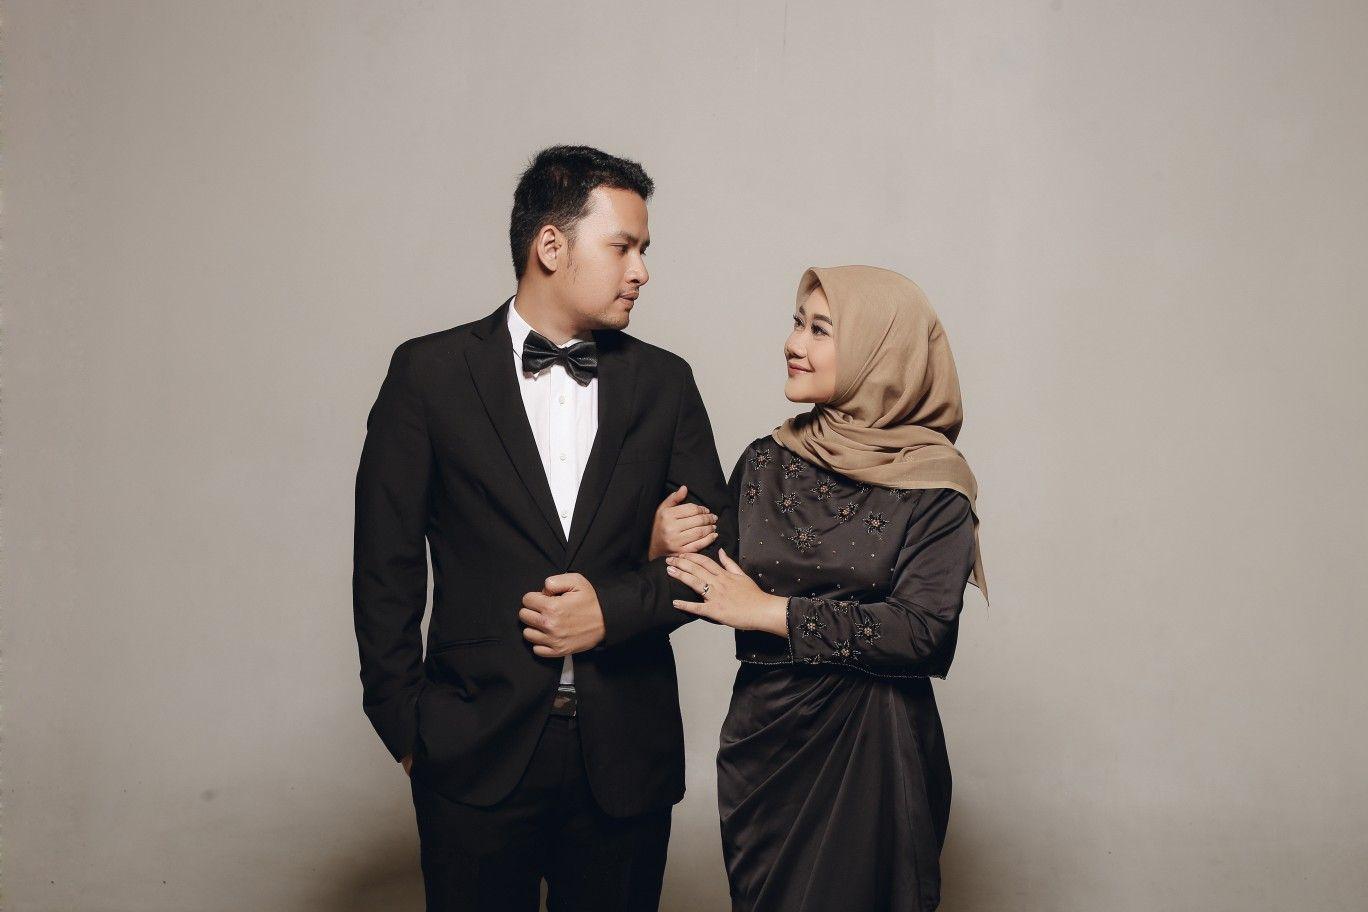 Hijab Couple Prewedding Studio Photoshoot Foto Perkawinan Pose Perkawinan Pose